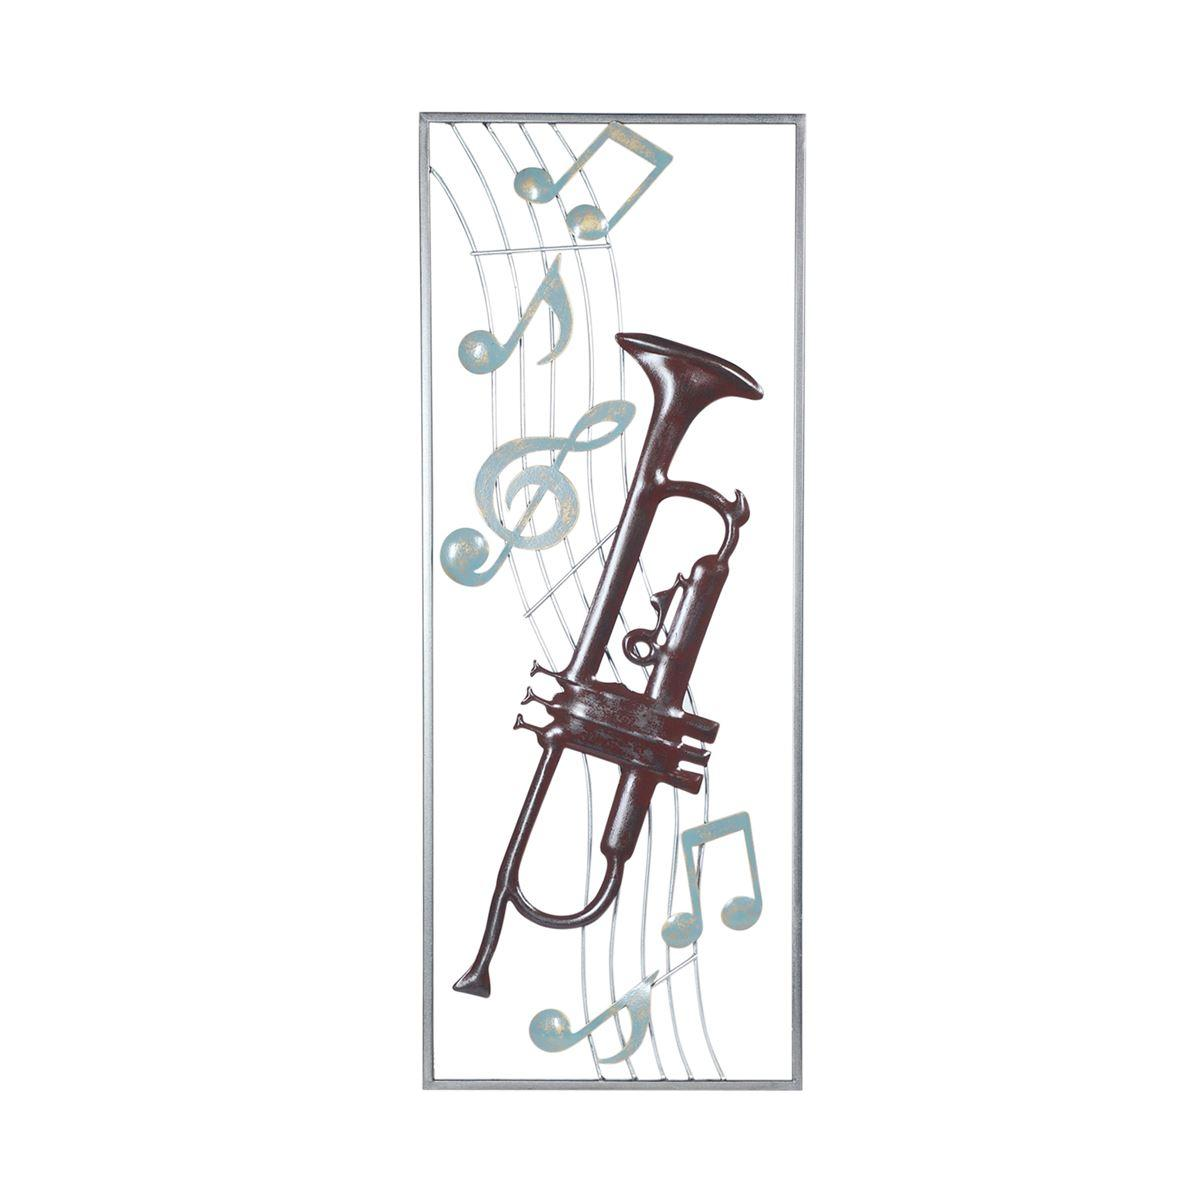 trompeta-con-pentagrama-notas-musicales-adorno-pared-metal-decorado-color-hueco-signes-grimalt-musica-20730-lomejorsg.jpg